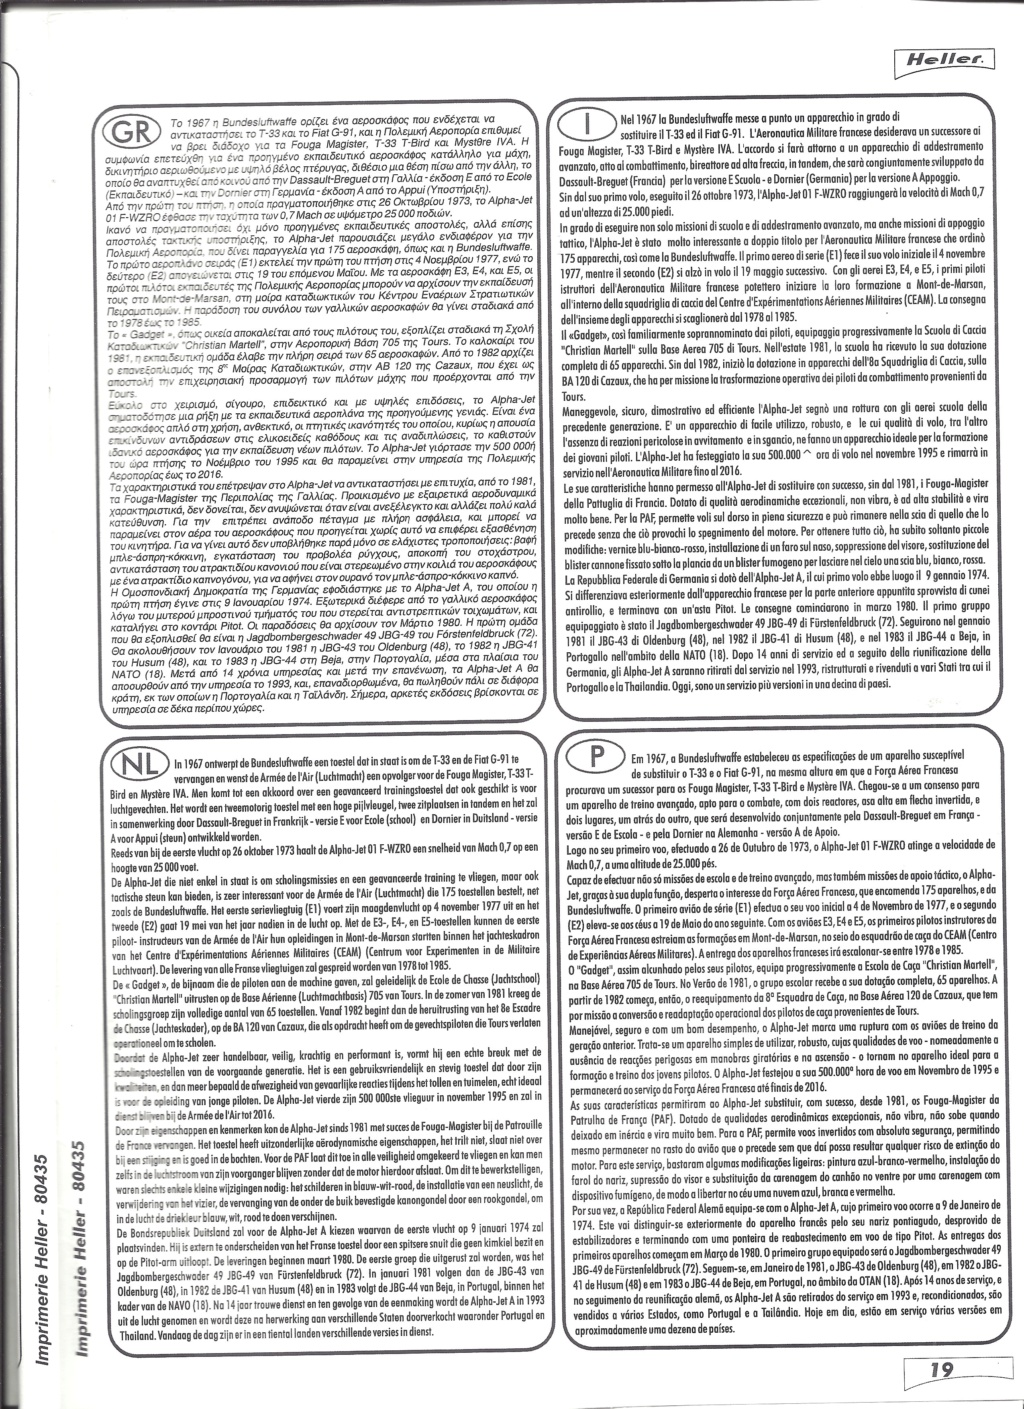 DASSAULT-BREGUET DORNIER ALPHA JET 1/48ème Réf 80435 Notice Helle674